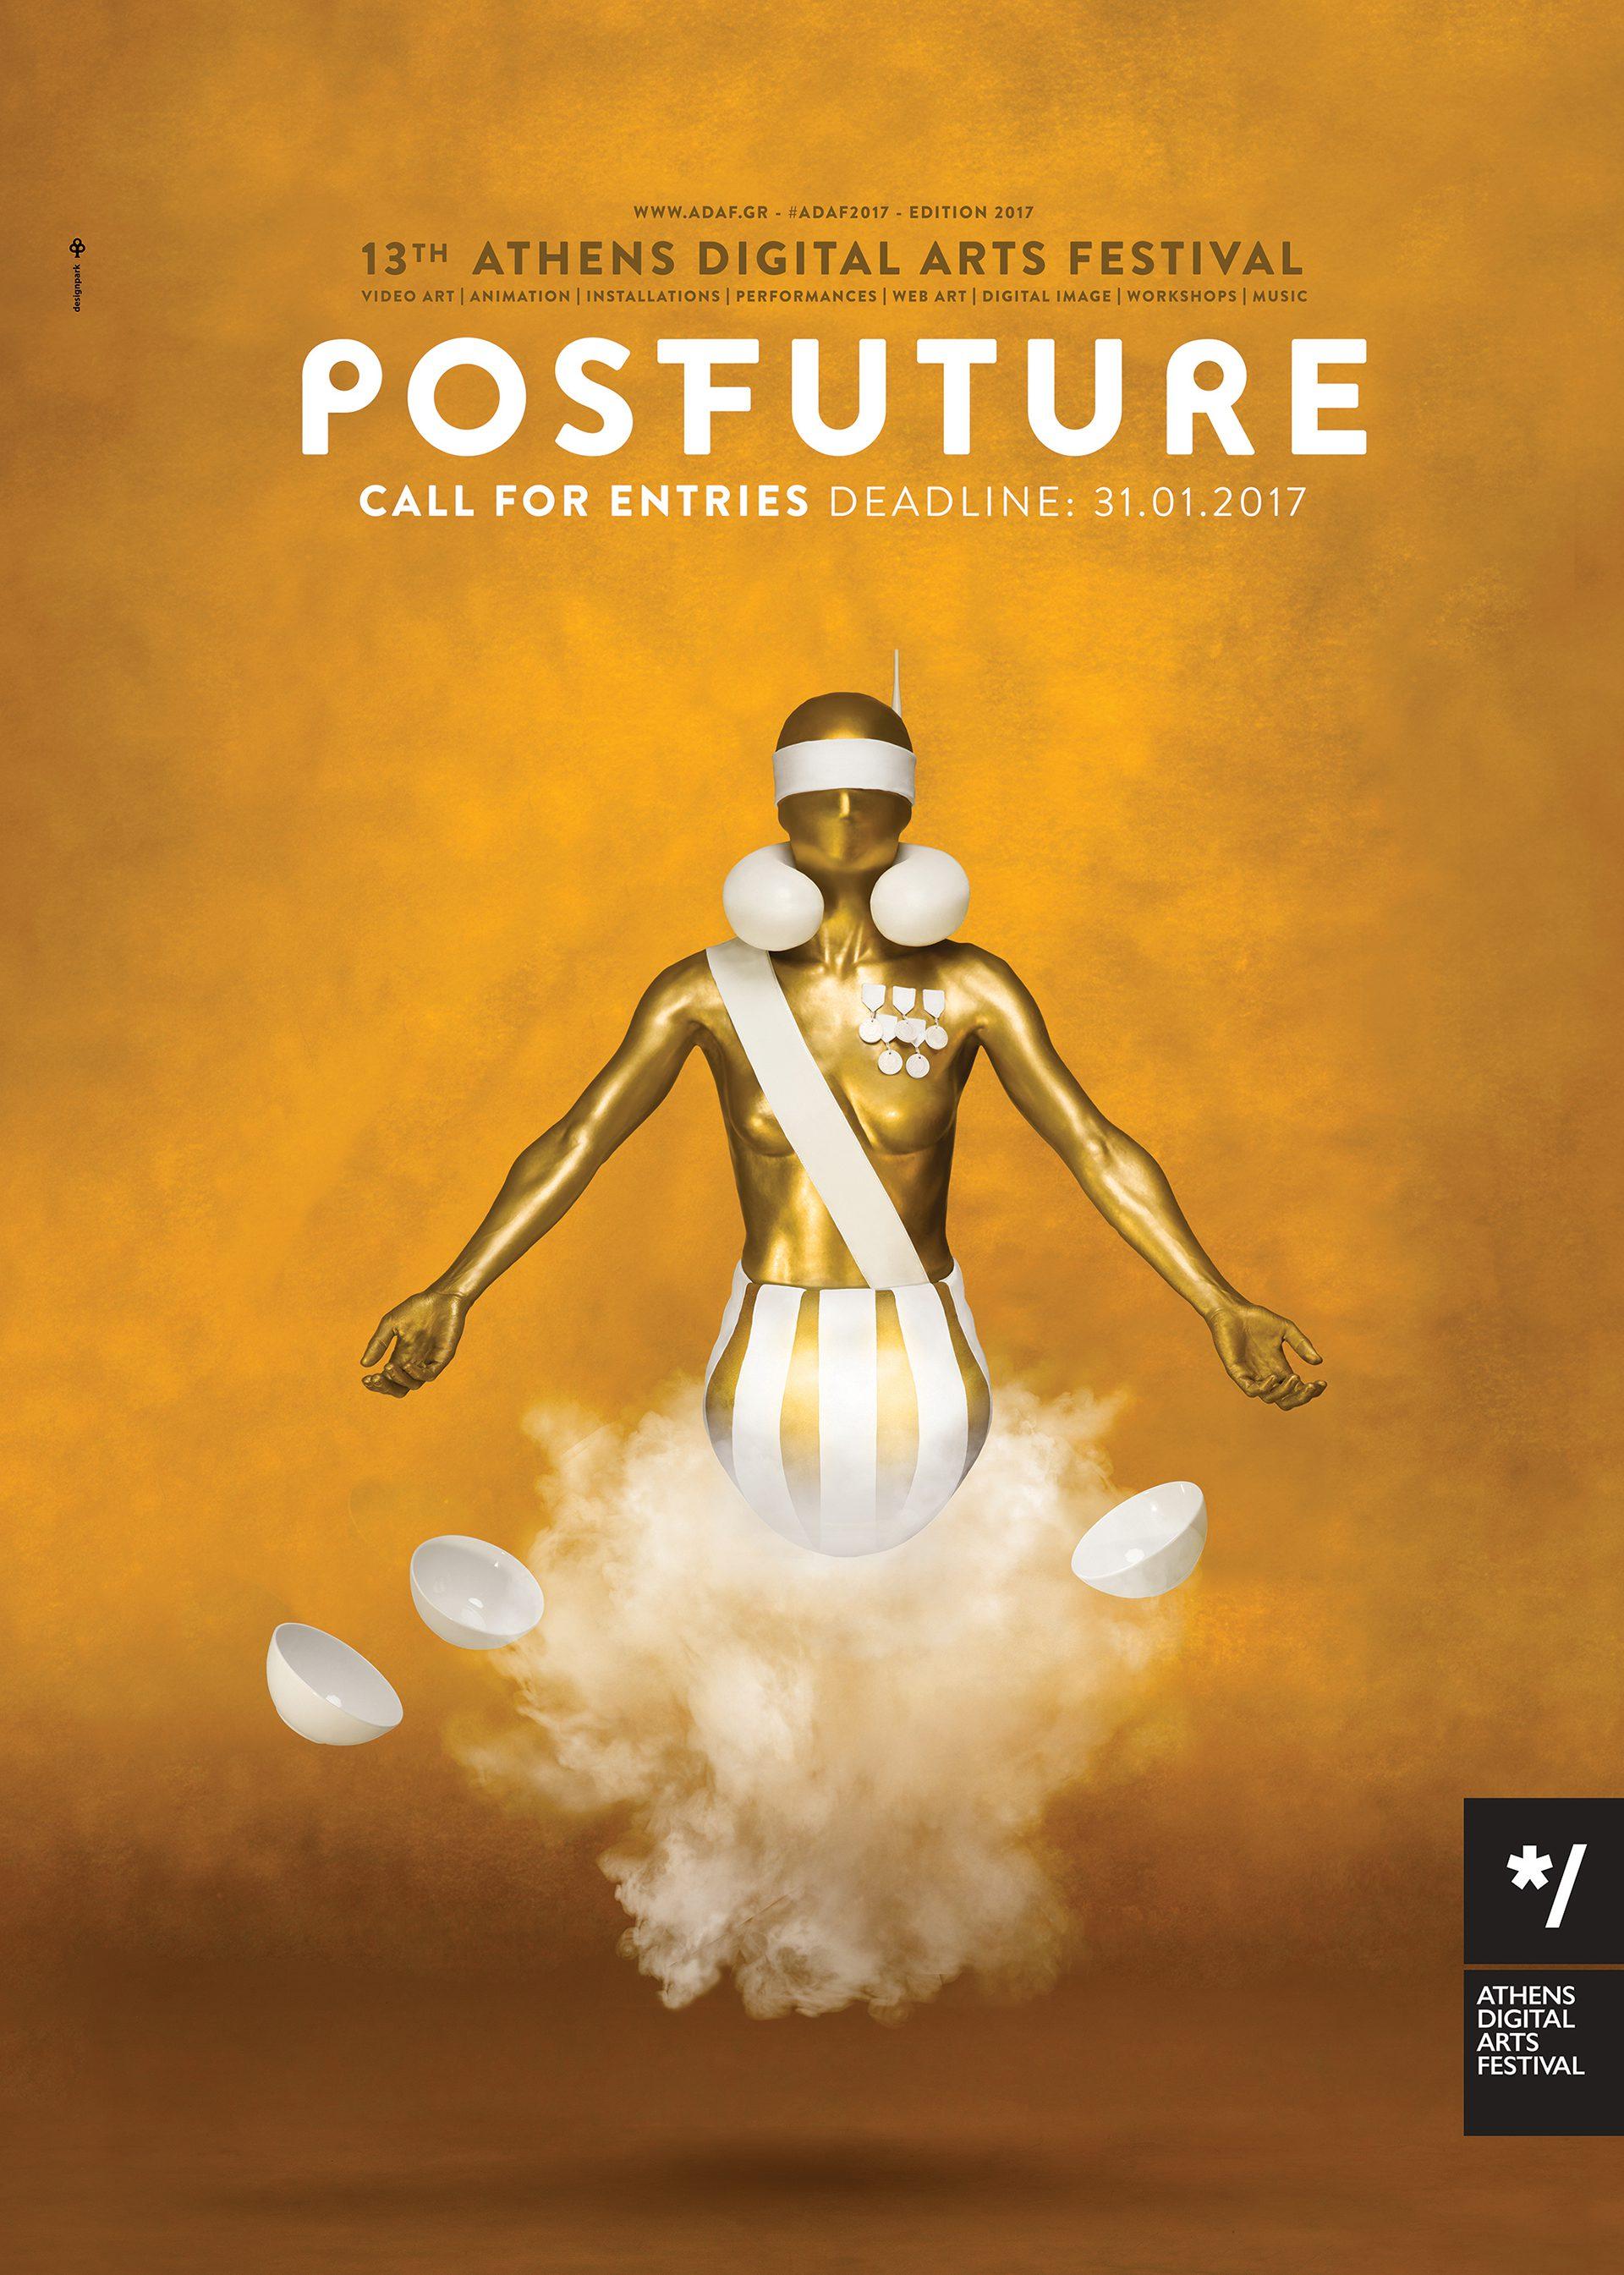 designpark_adaf_postfuture_athens_digital_arts_festival